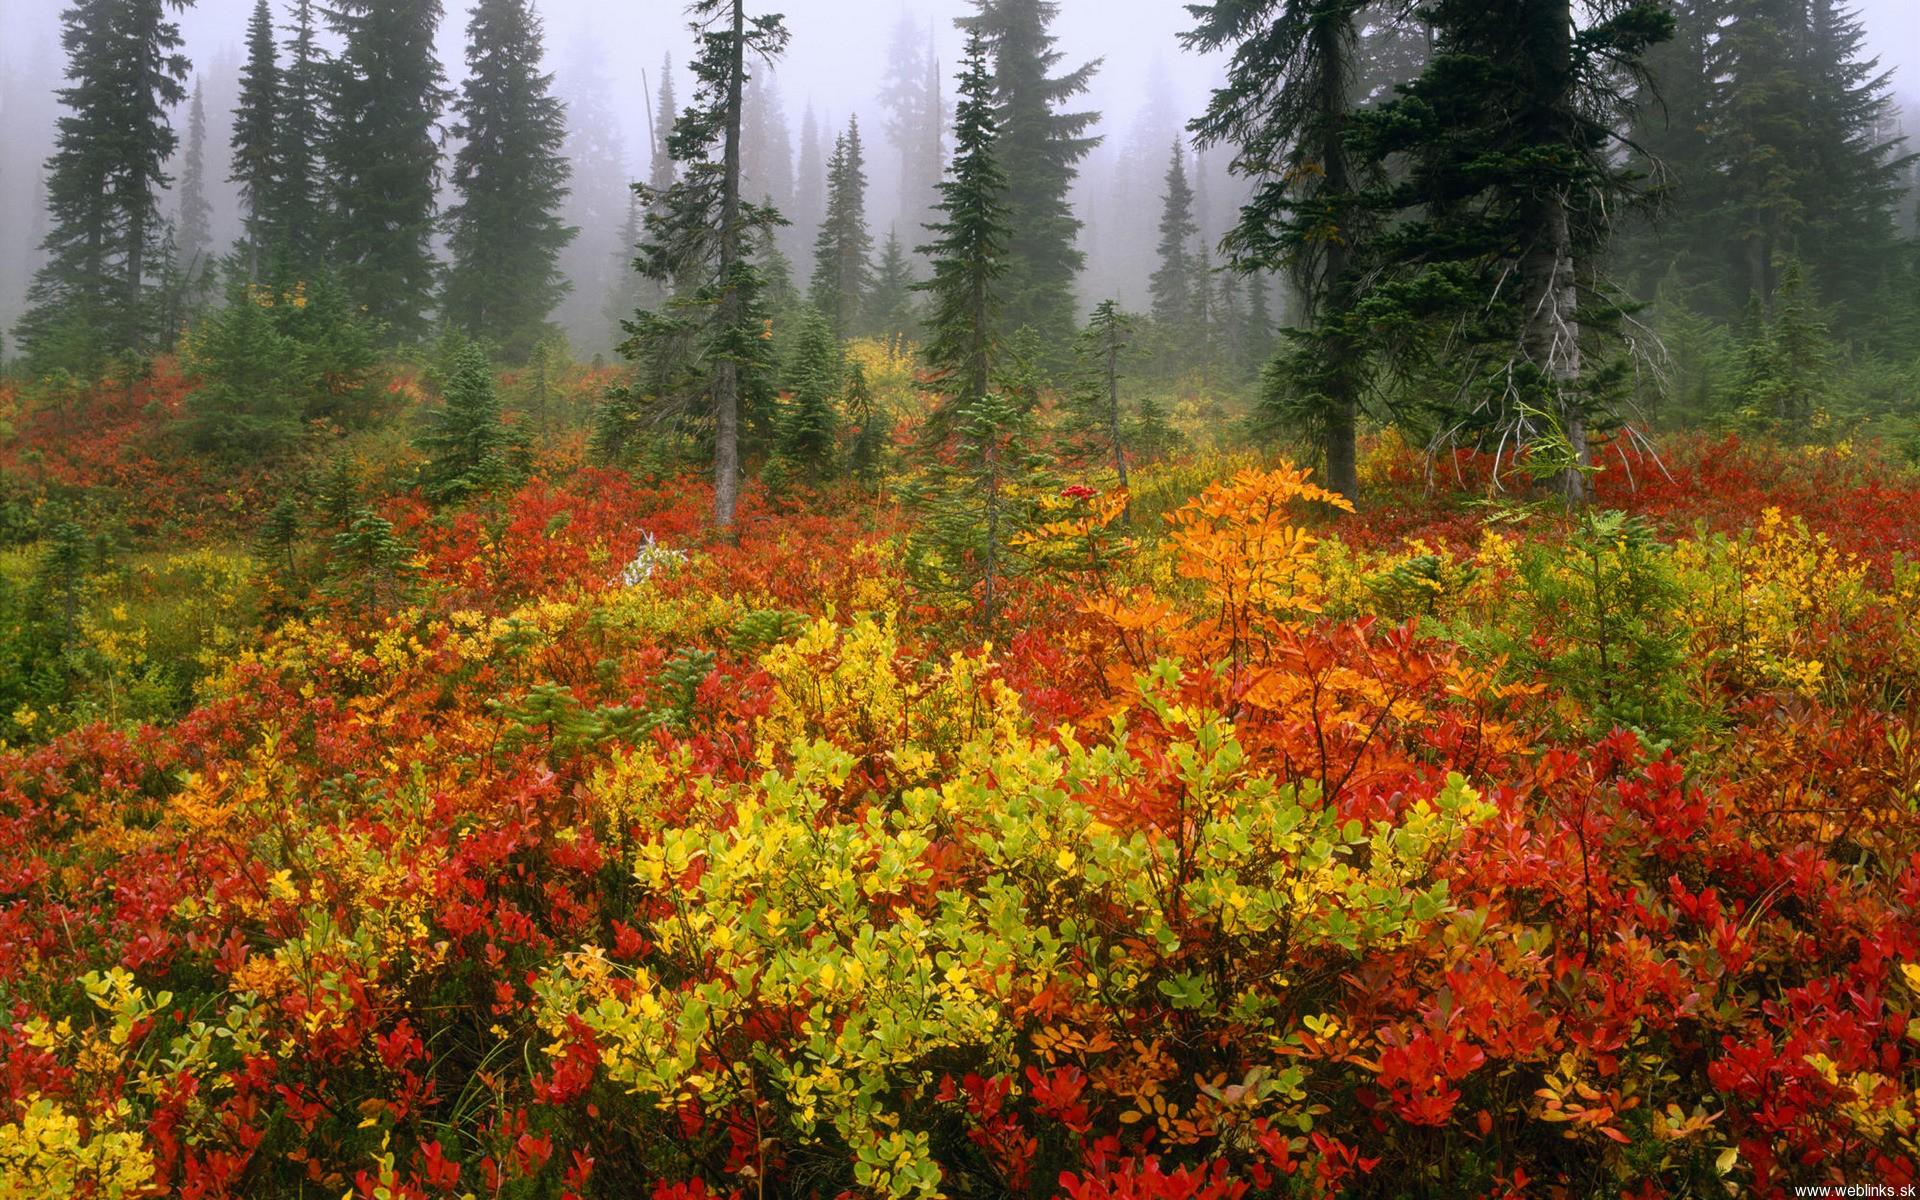 USA, Washington, Mt Rainier NP, Fall colors on a cloudy morning